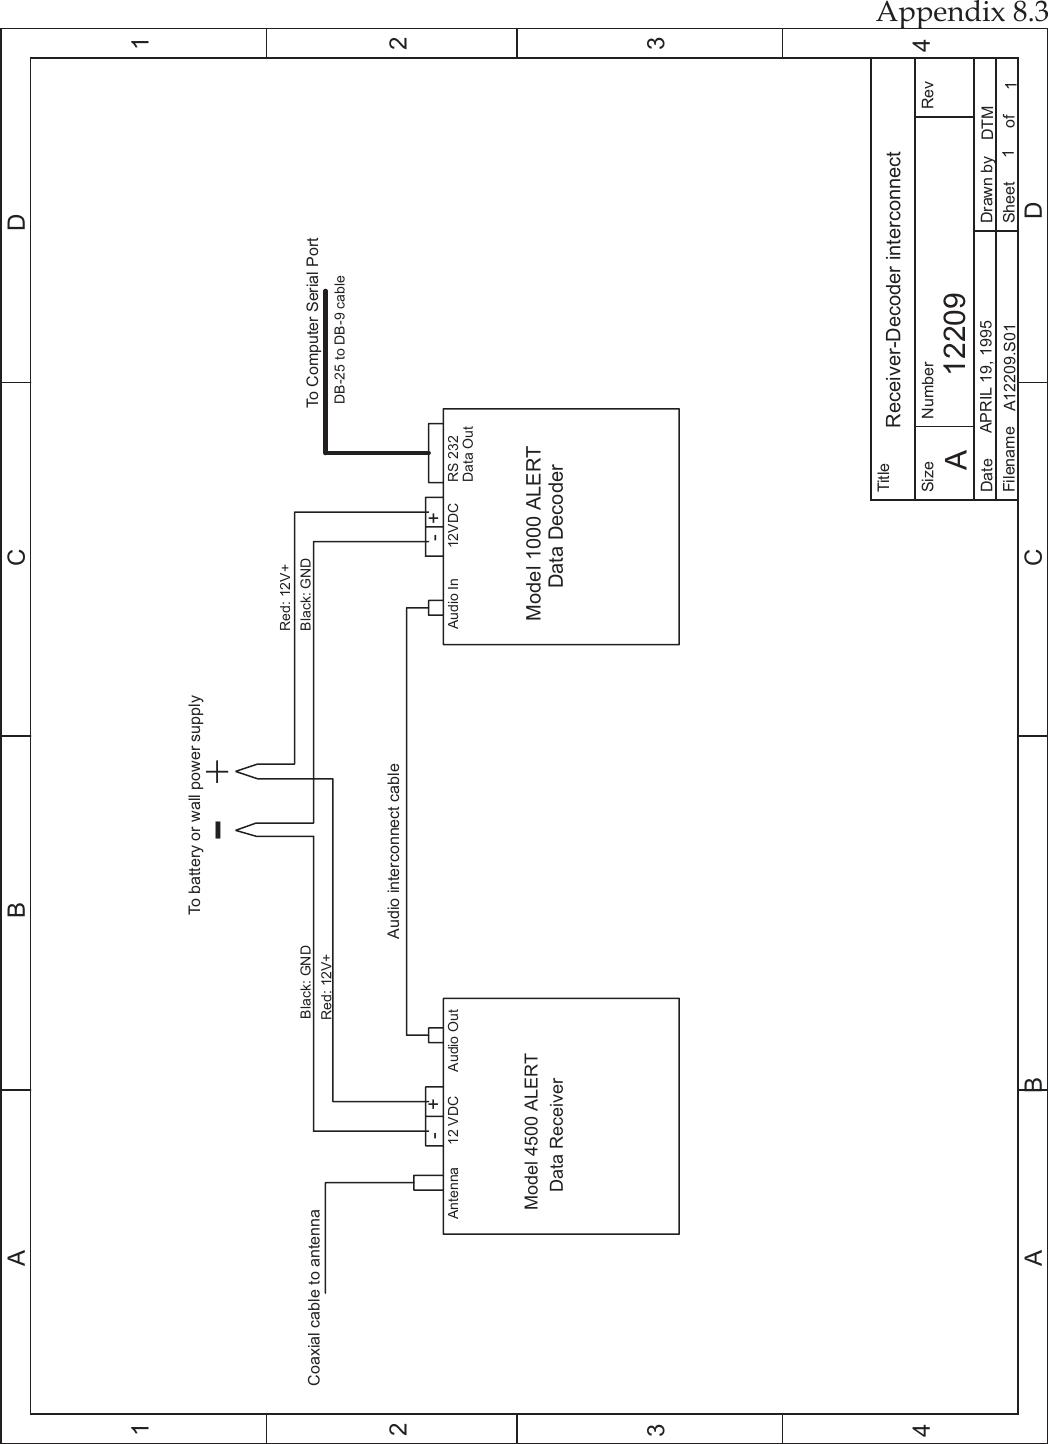 High Sierra Stereo Receiver 4500 Users Manual 01_B_ Jb_edit